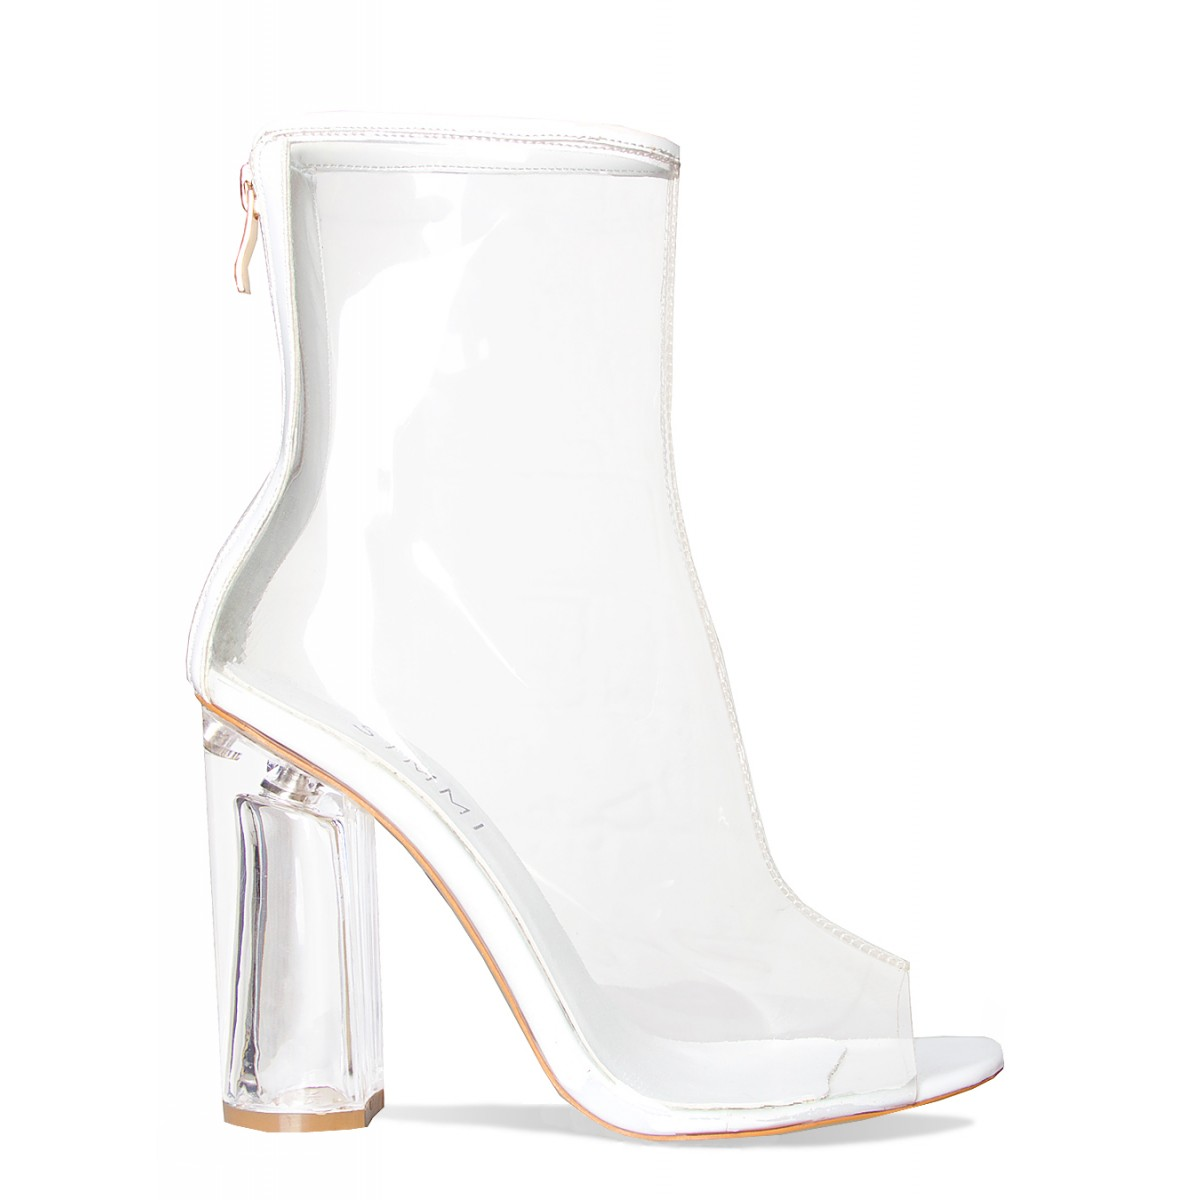 Melissa White Peep Toe Perspex Heel Ankle Boots   Simmi Shoes